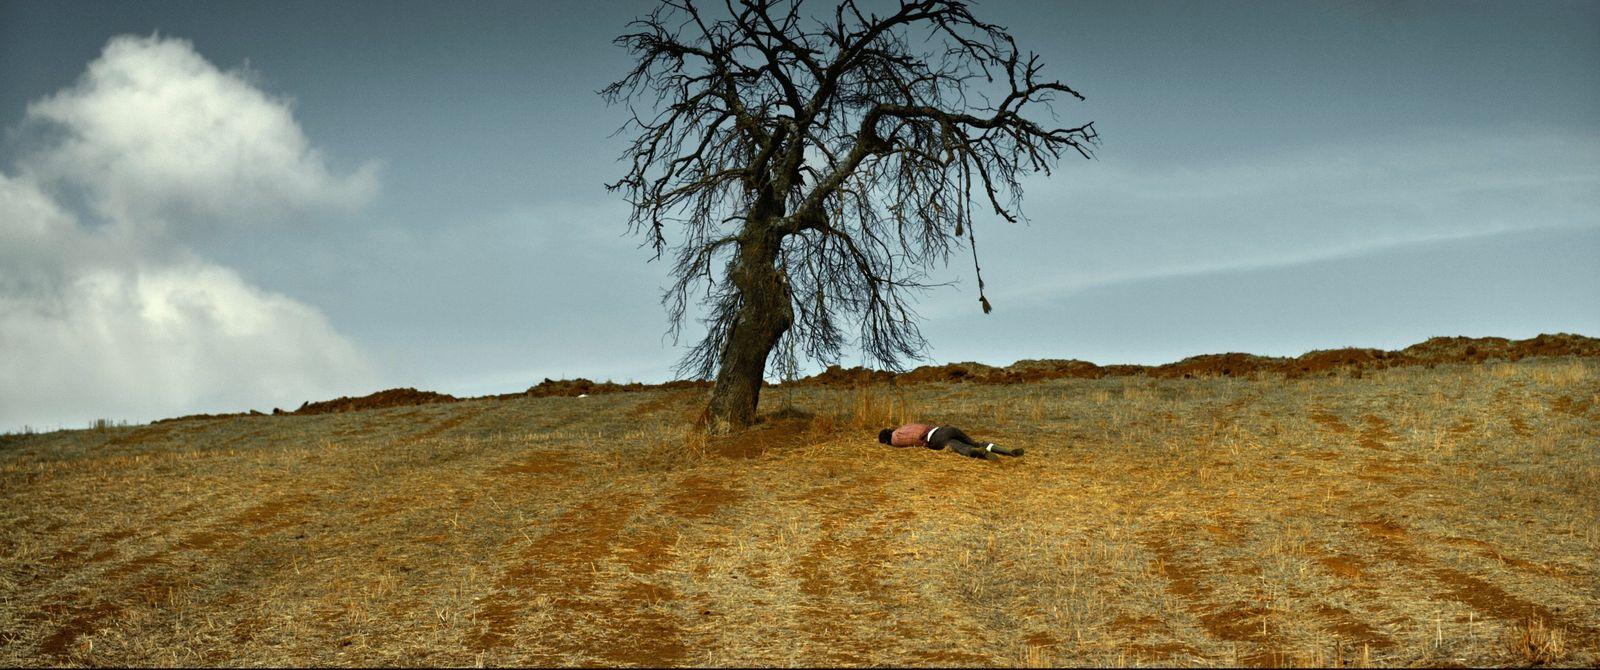 Film/ The Wild Pear Tree